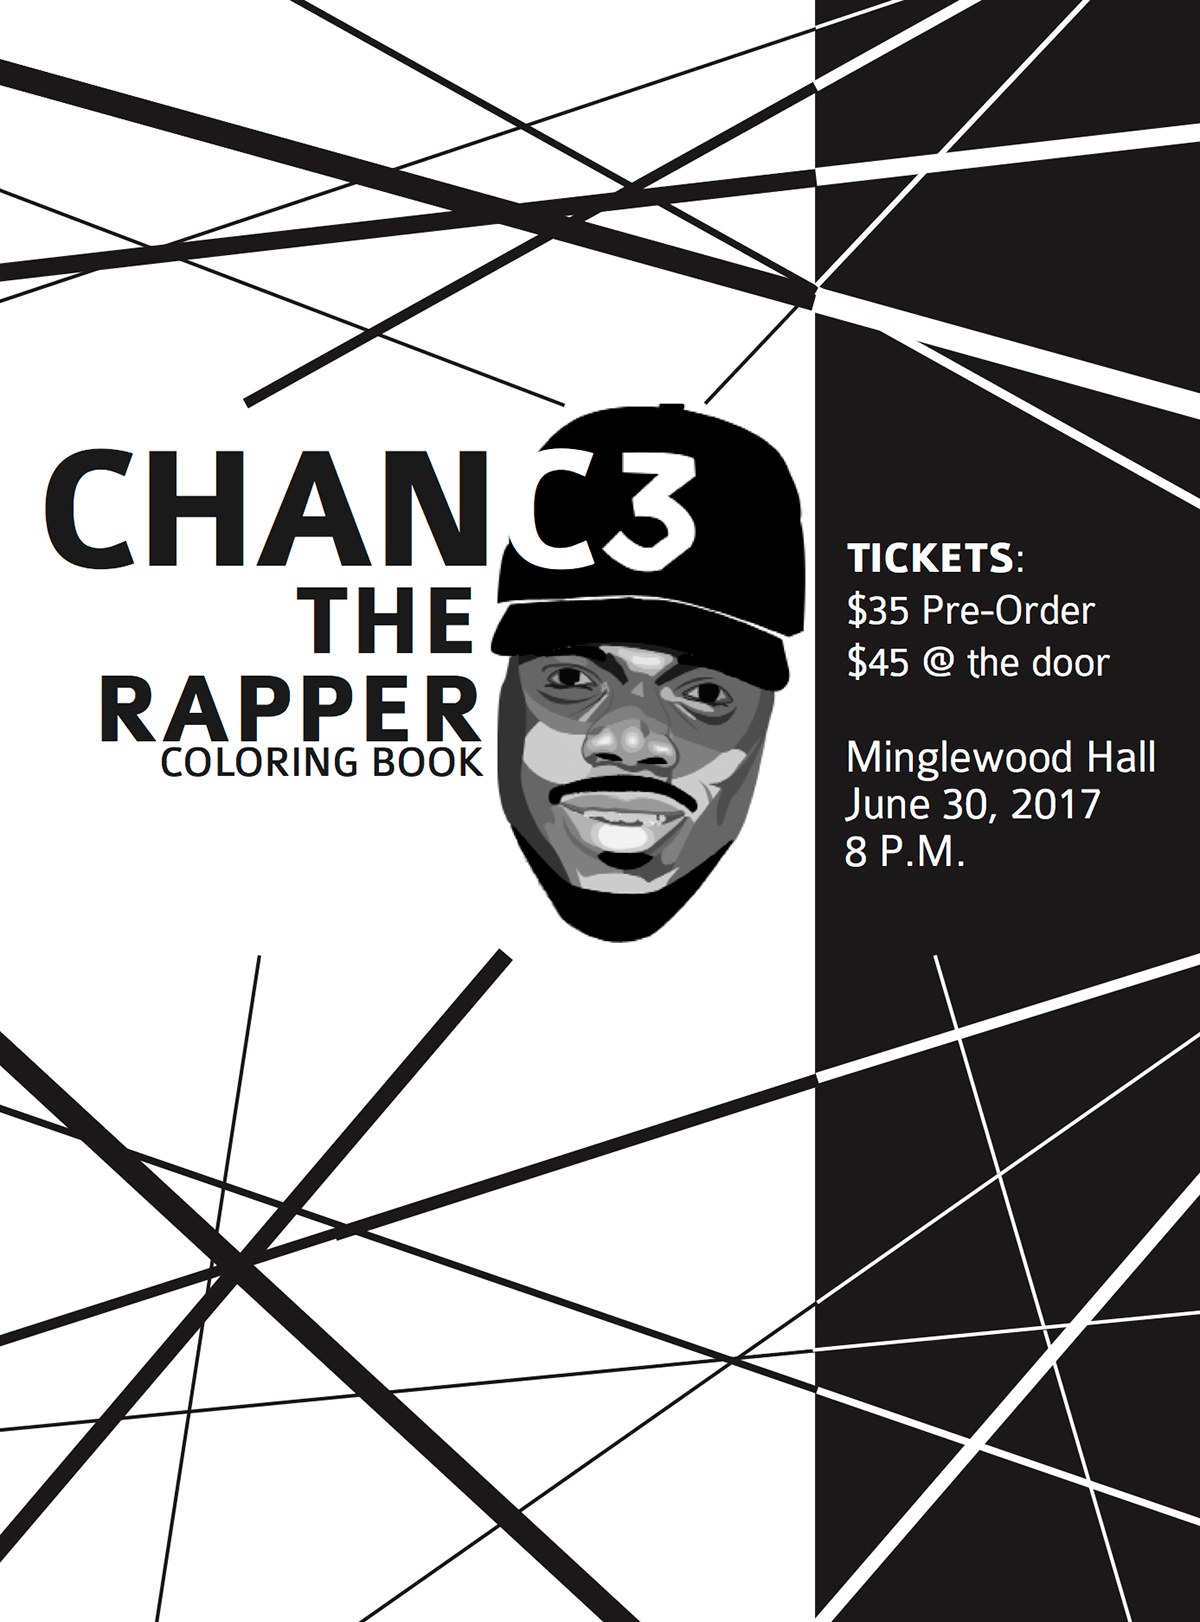 a18806d893ff Chance the Rapper Advertisement on Behance